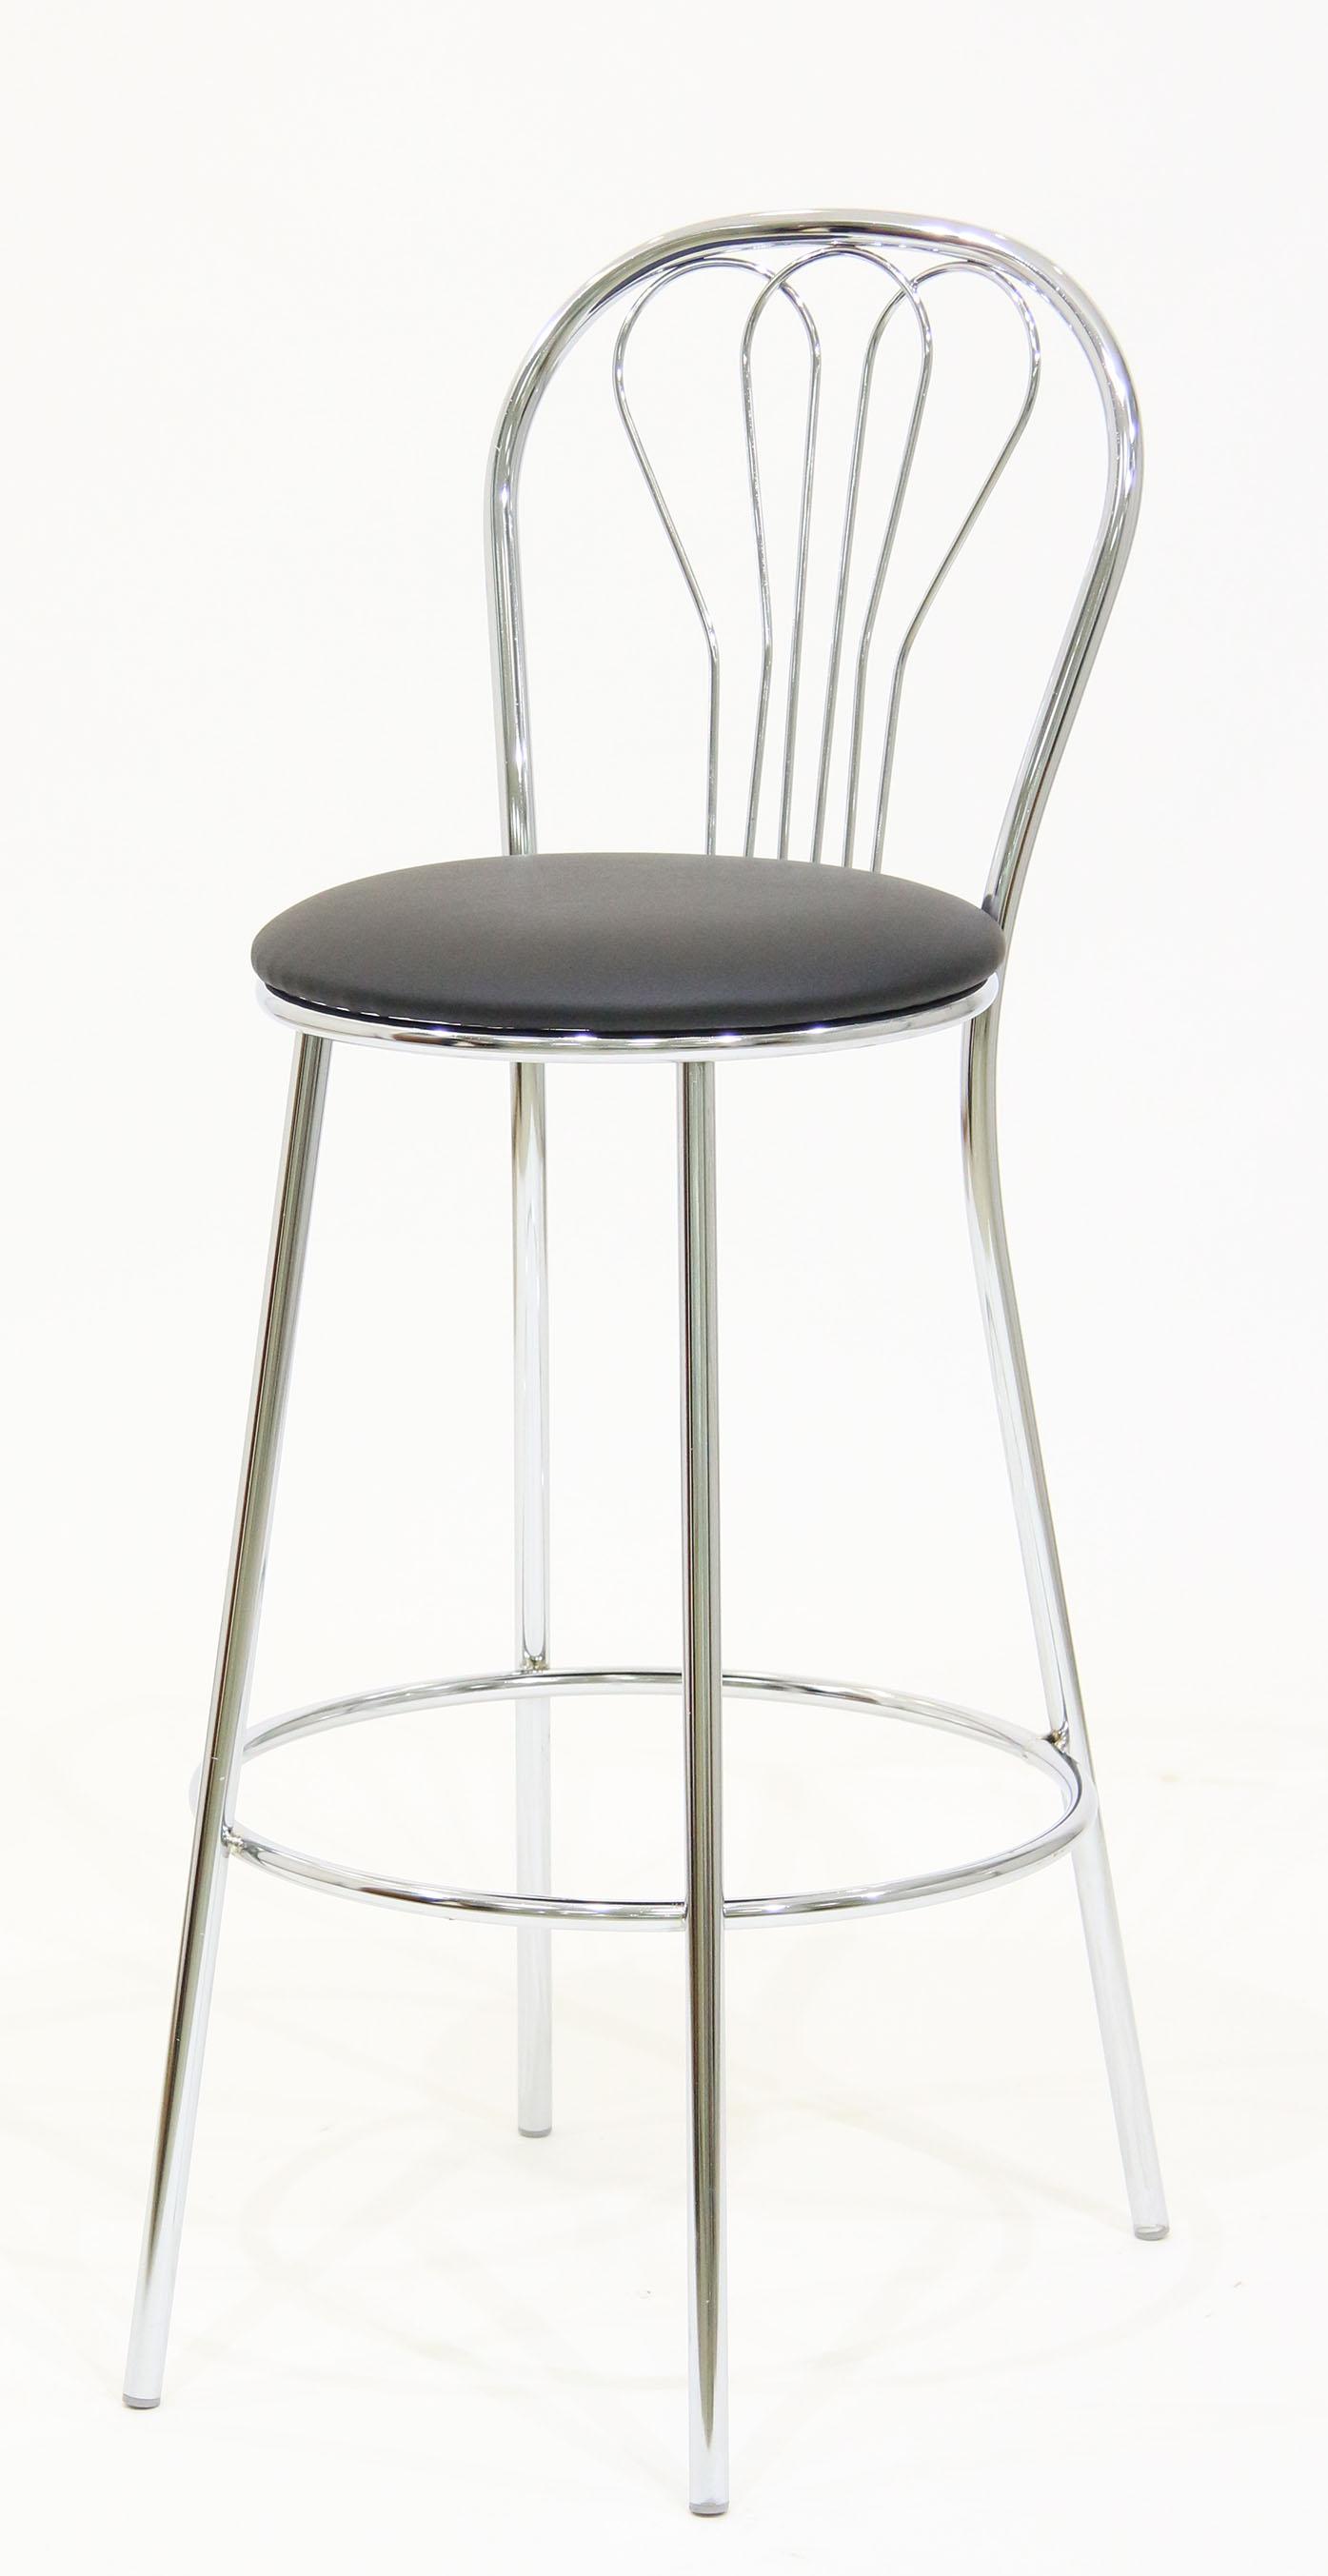 стул Ромашка (Барный)